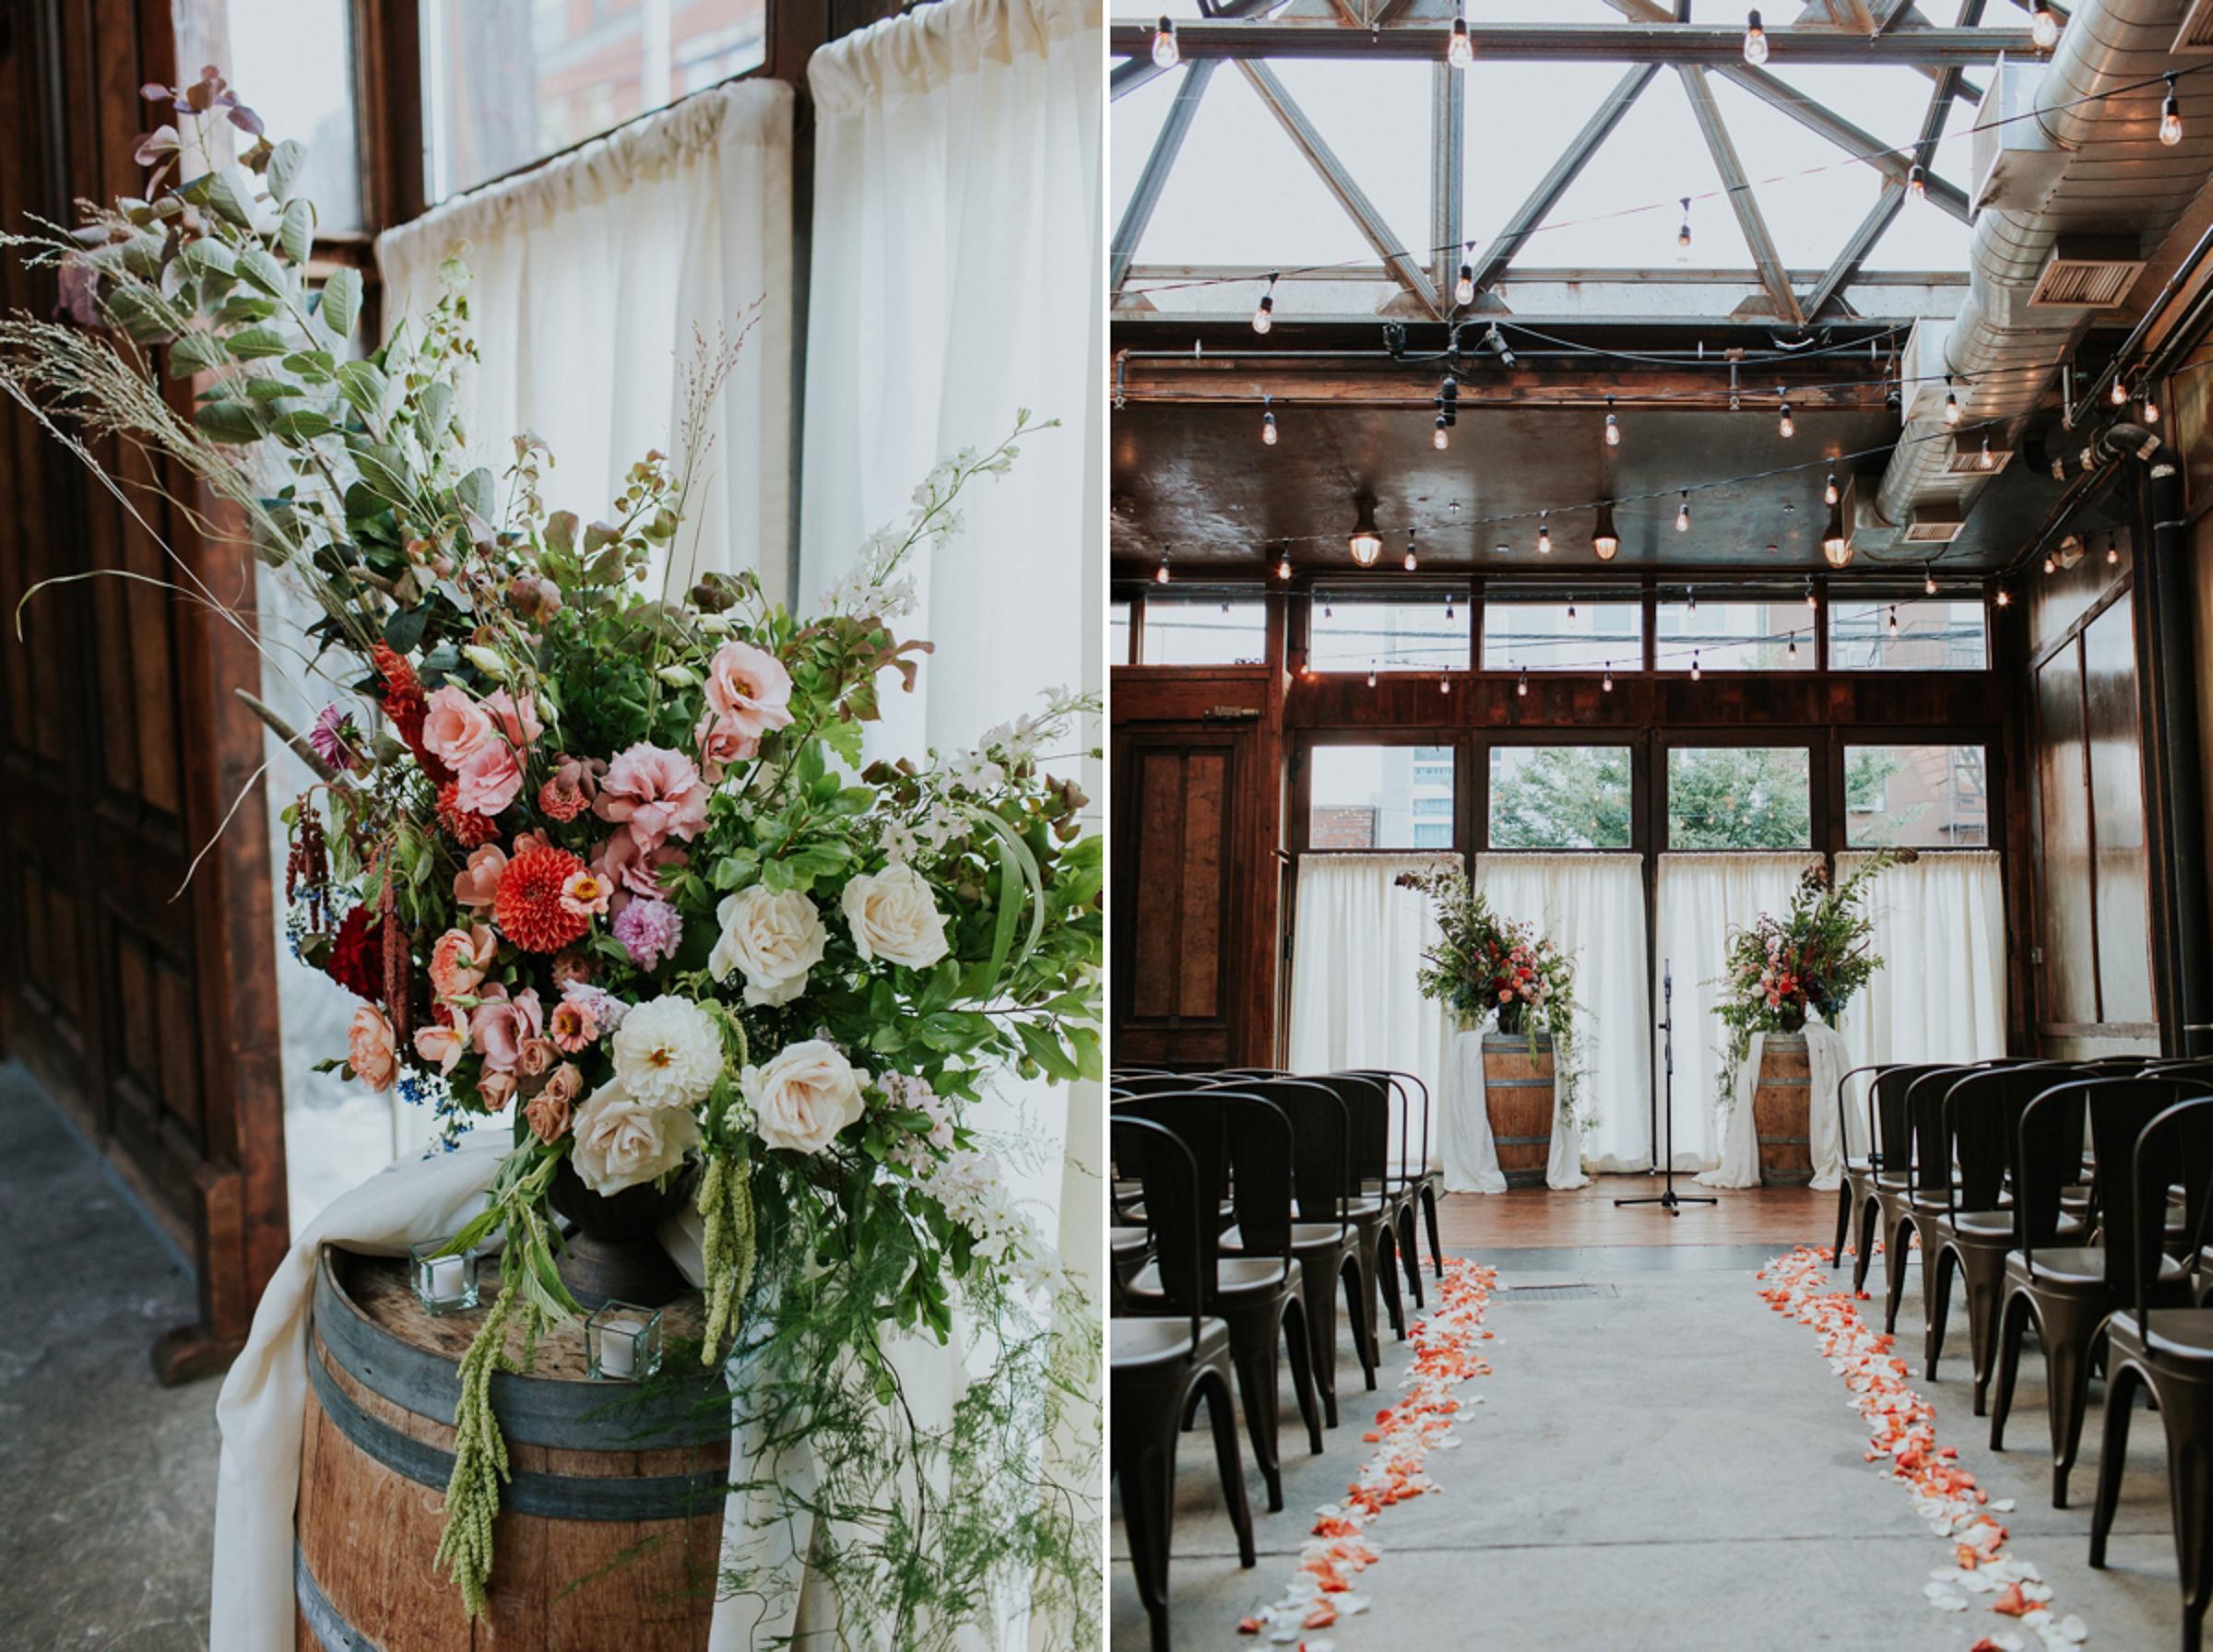 Brooklyn-Winery-NYC-Editorial-Documentary-Wedding-Photographer-Gina-Oli-126.jpg